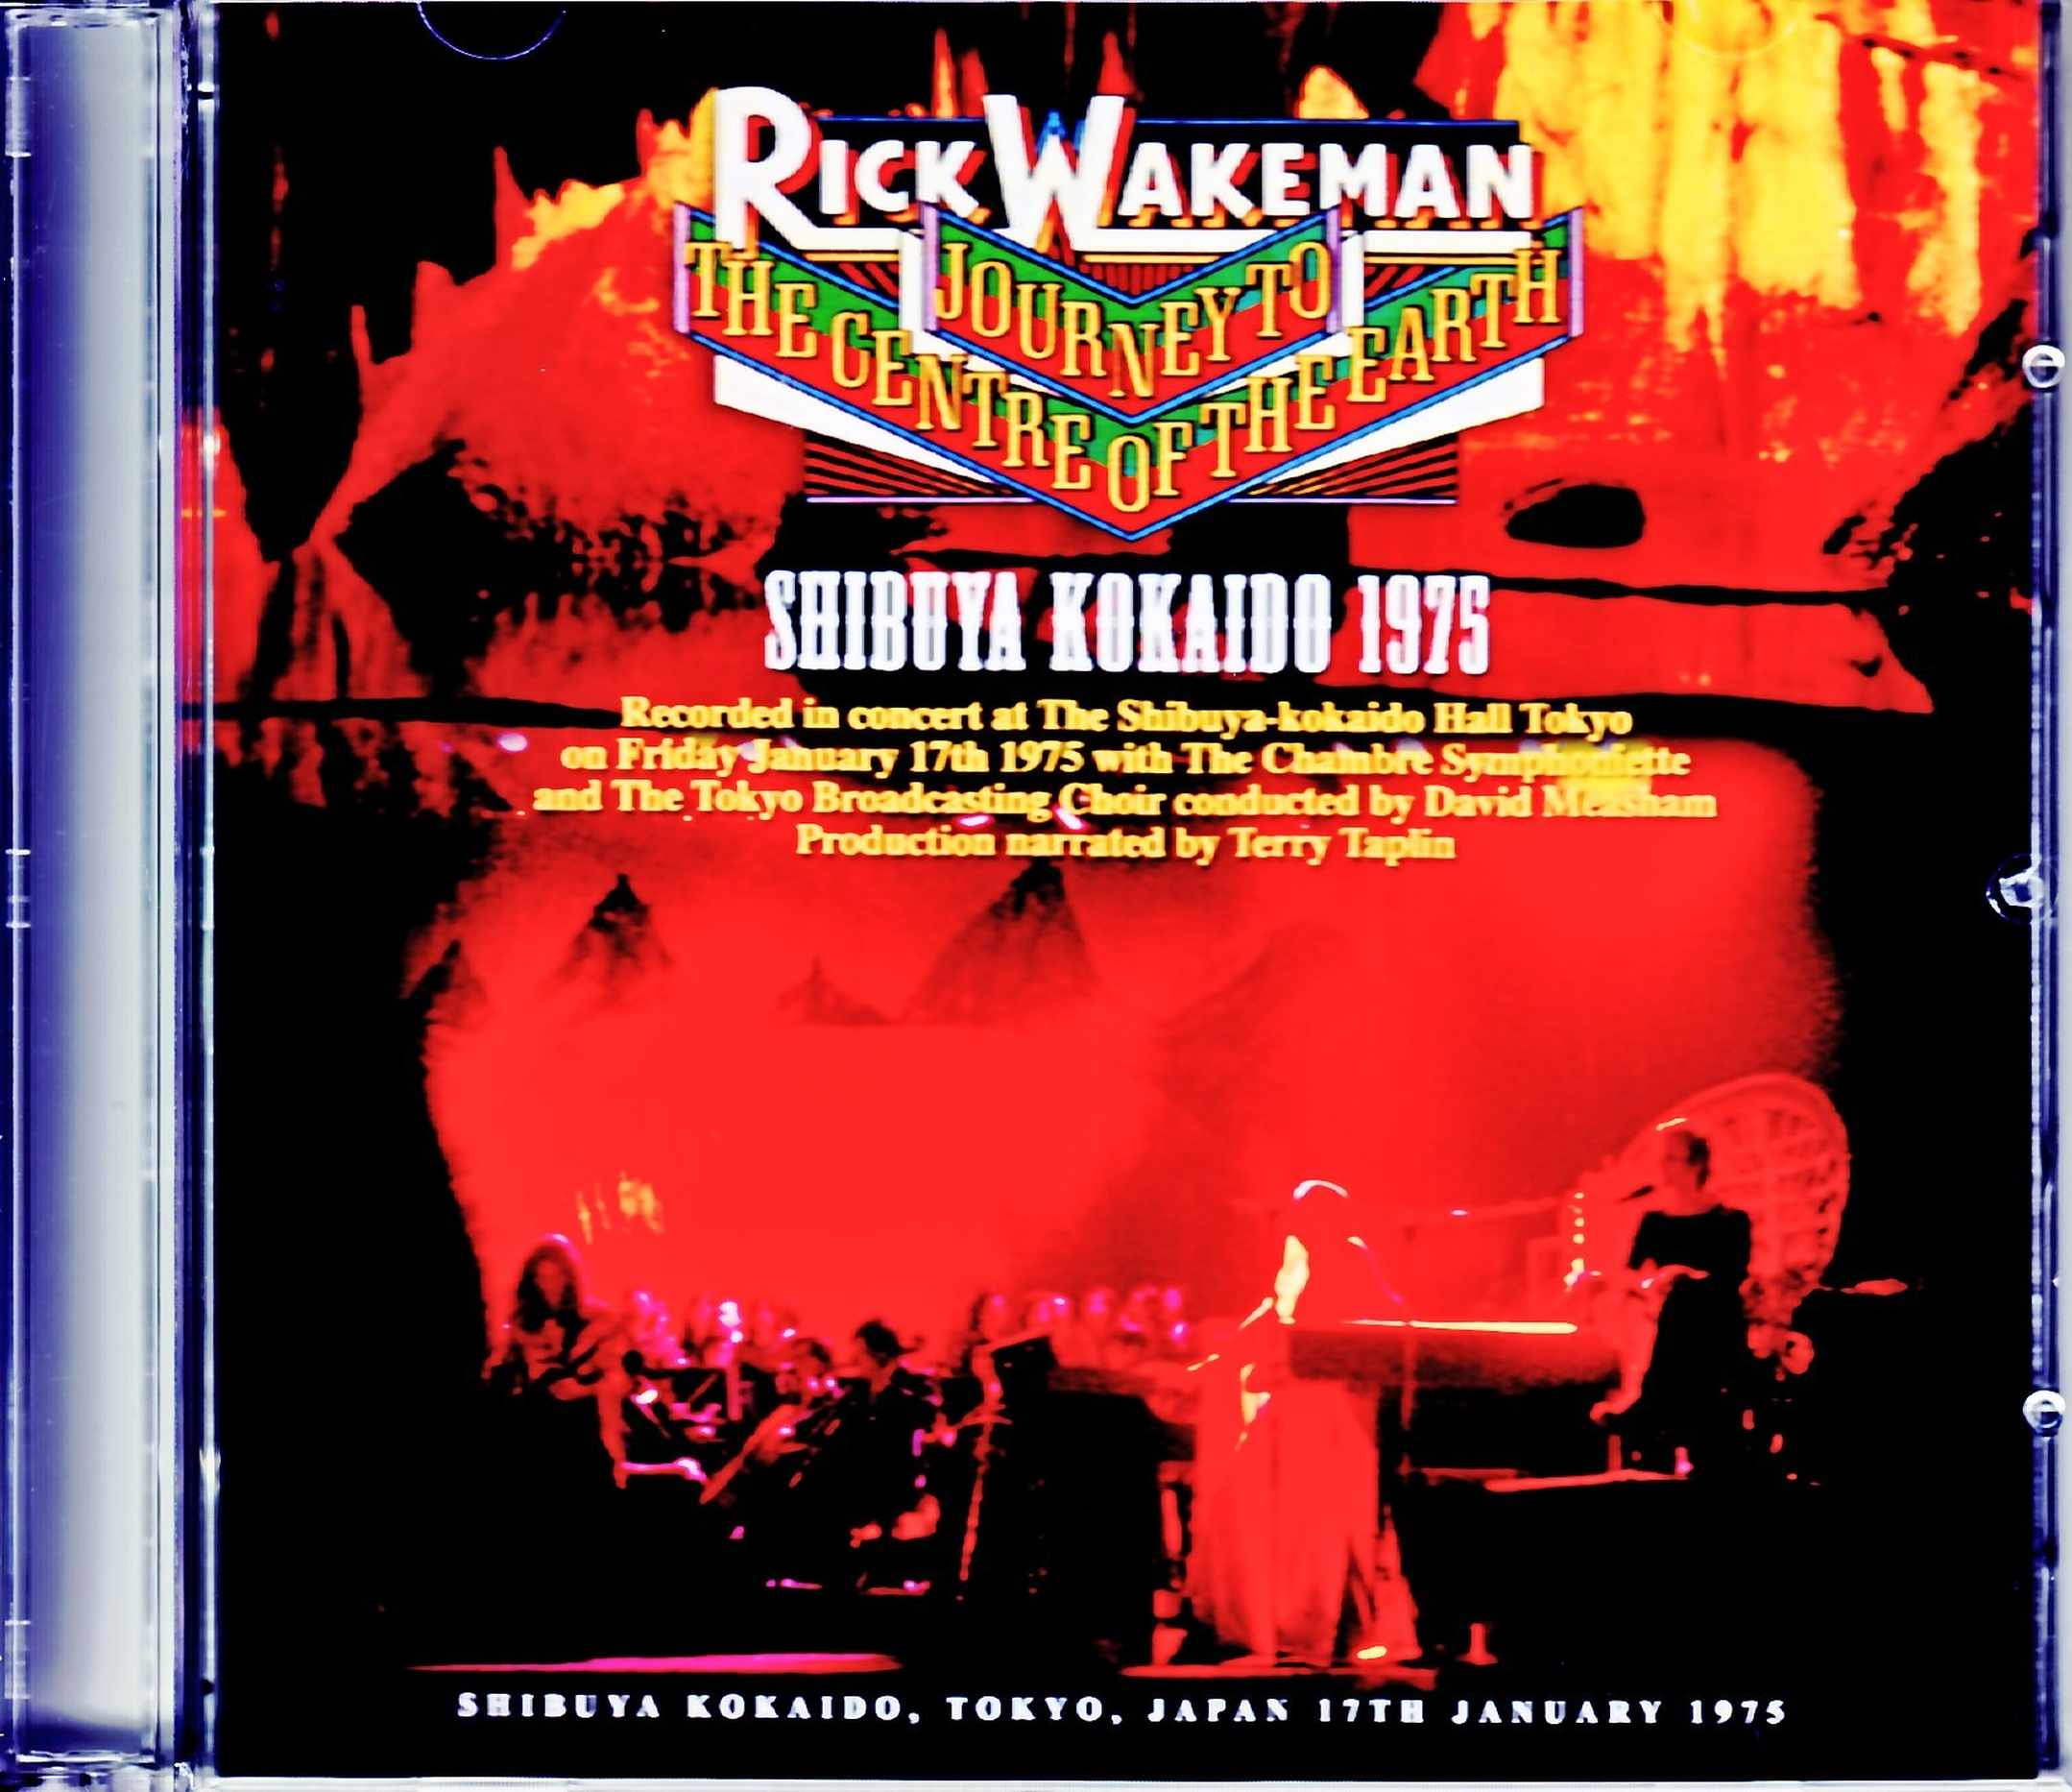 Rick Wakeman リック・ウェイクマン/Tokyo,Japan 1975 & more